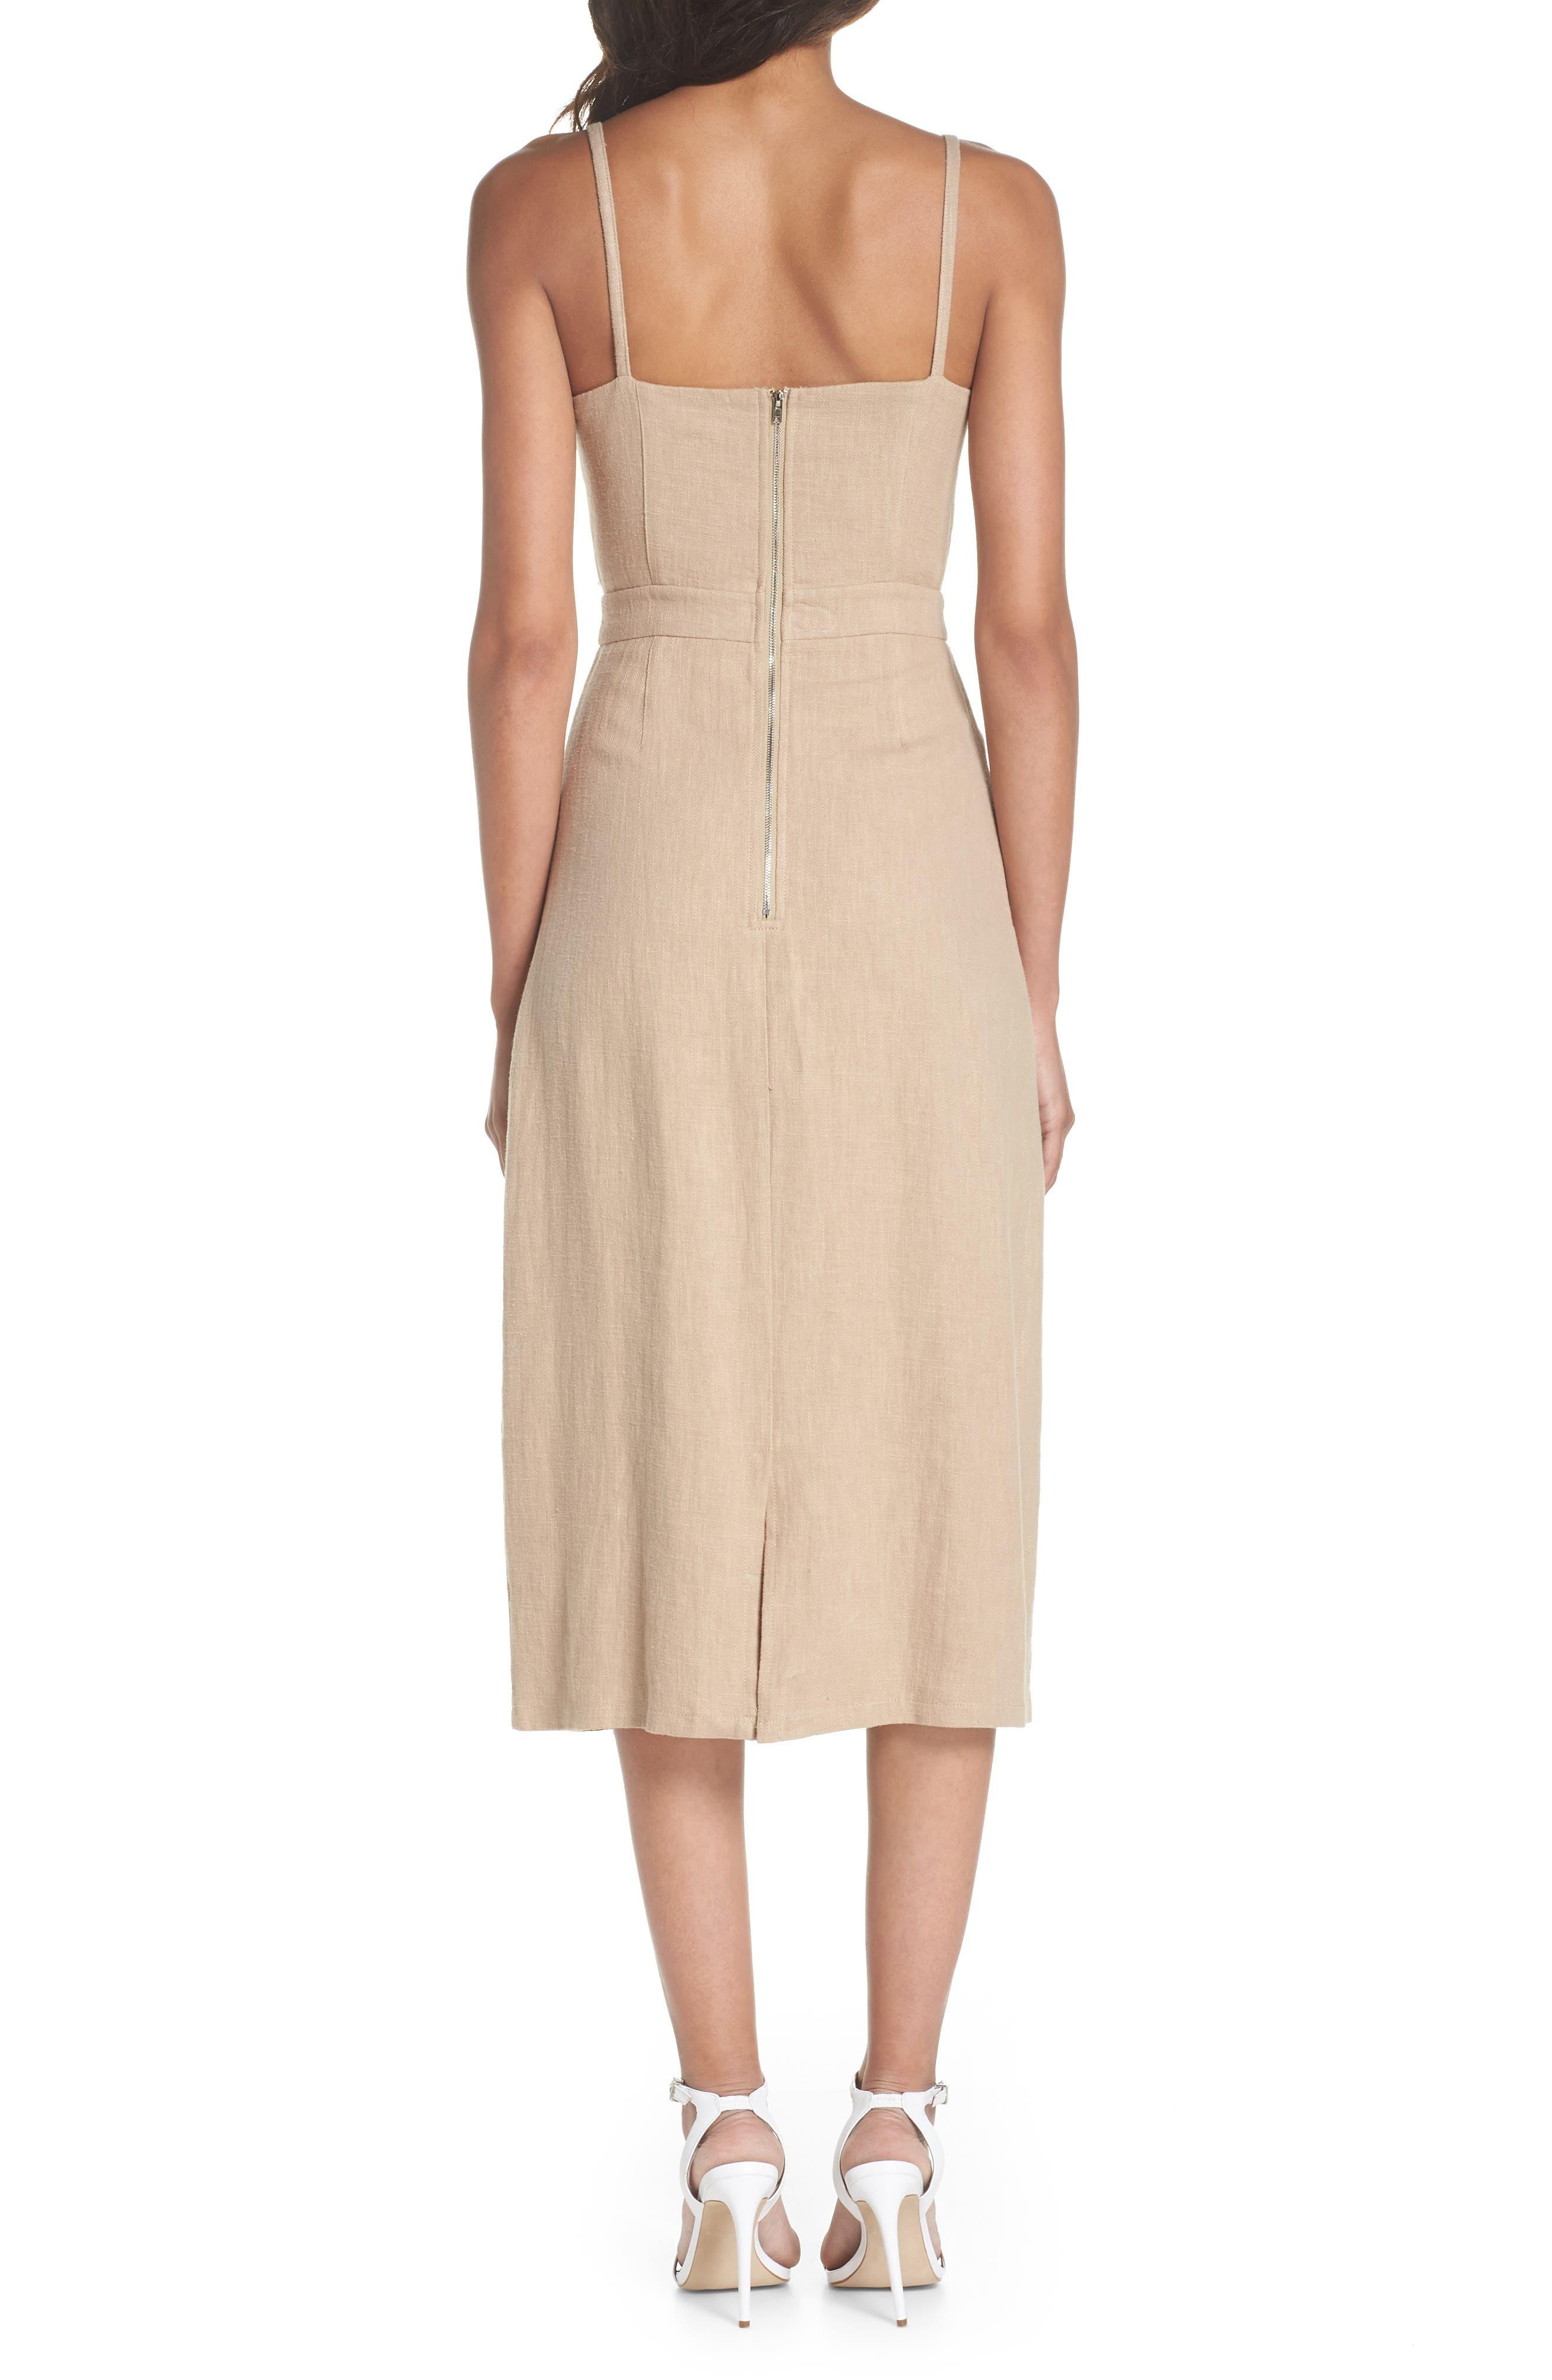 CAARA,                             Tie Front Linen Blend Sundress,                             Alternate thumbnail 2, color,                             250